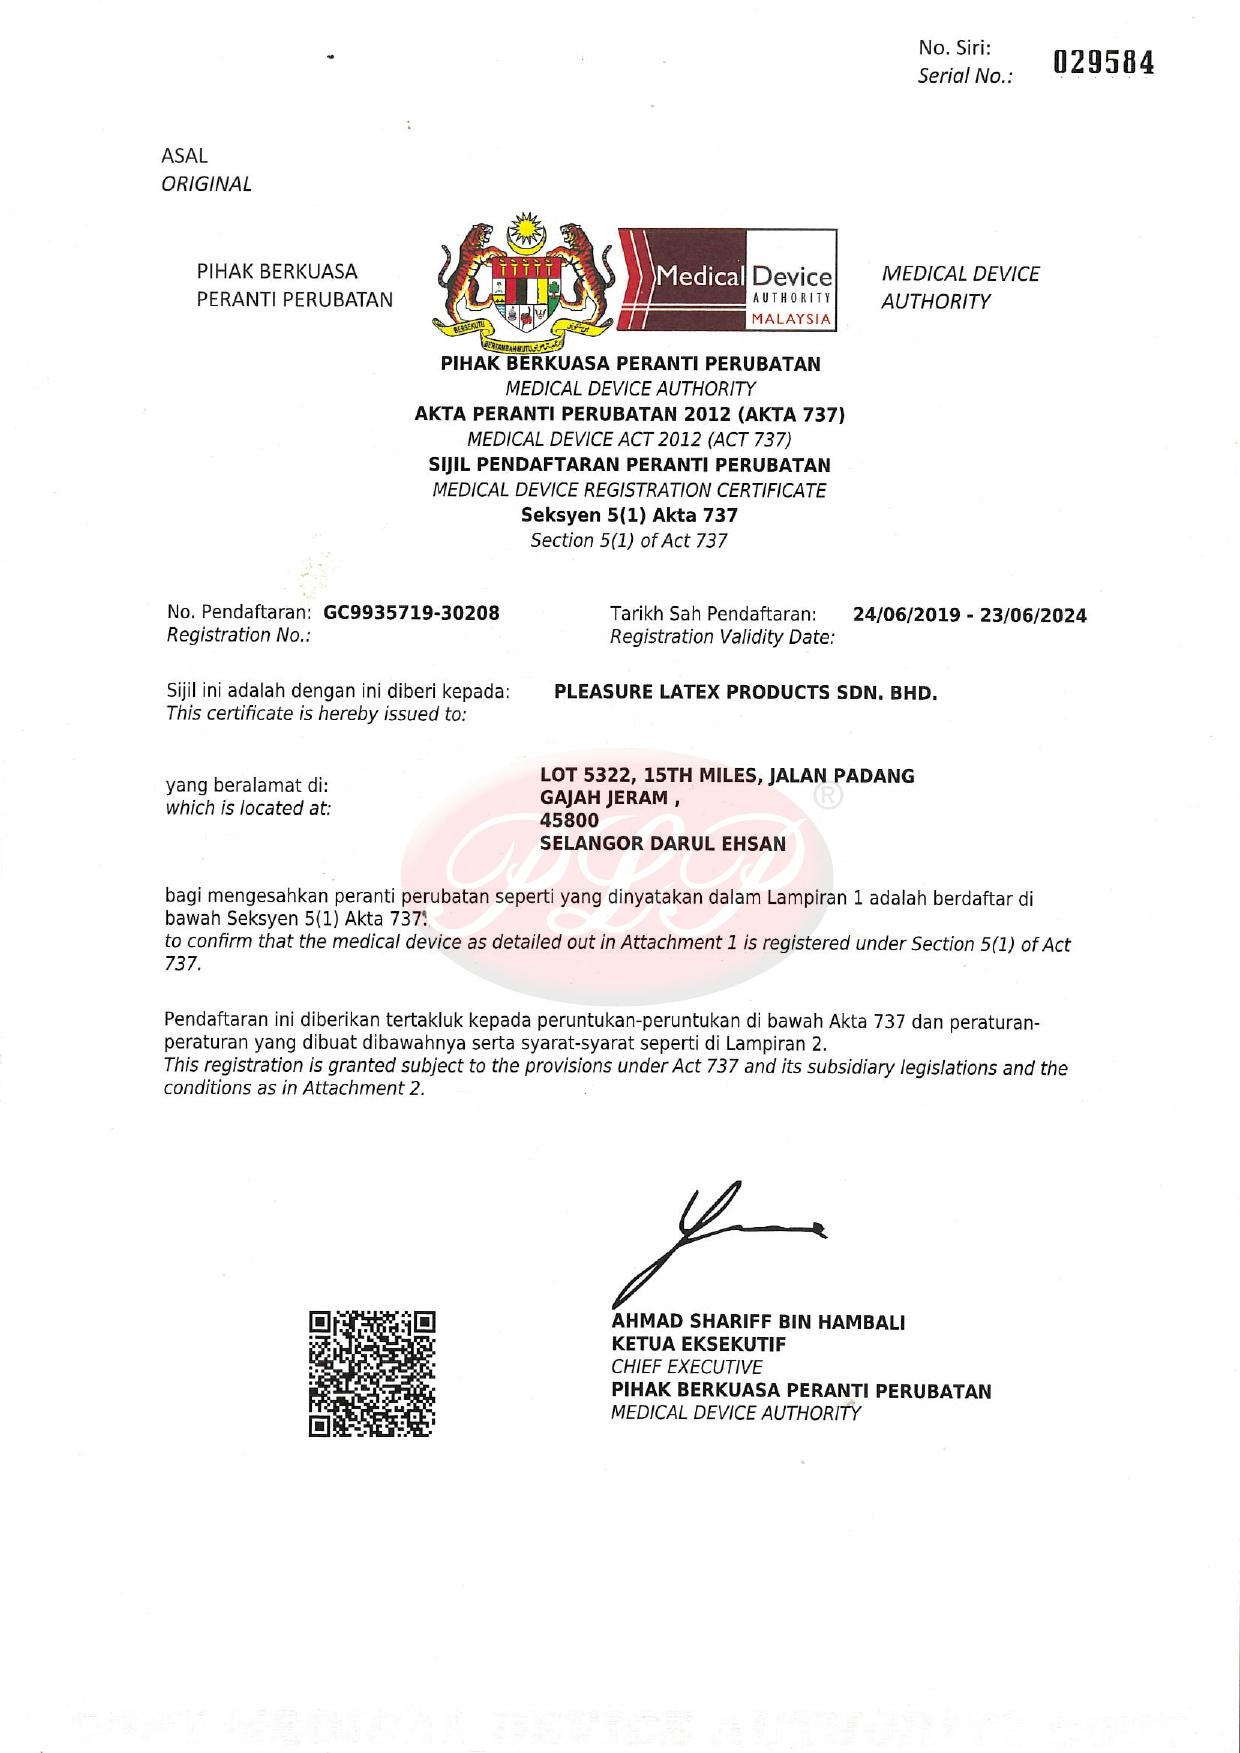 Malaysia MDA Registration Certificate - Sure Brand